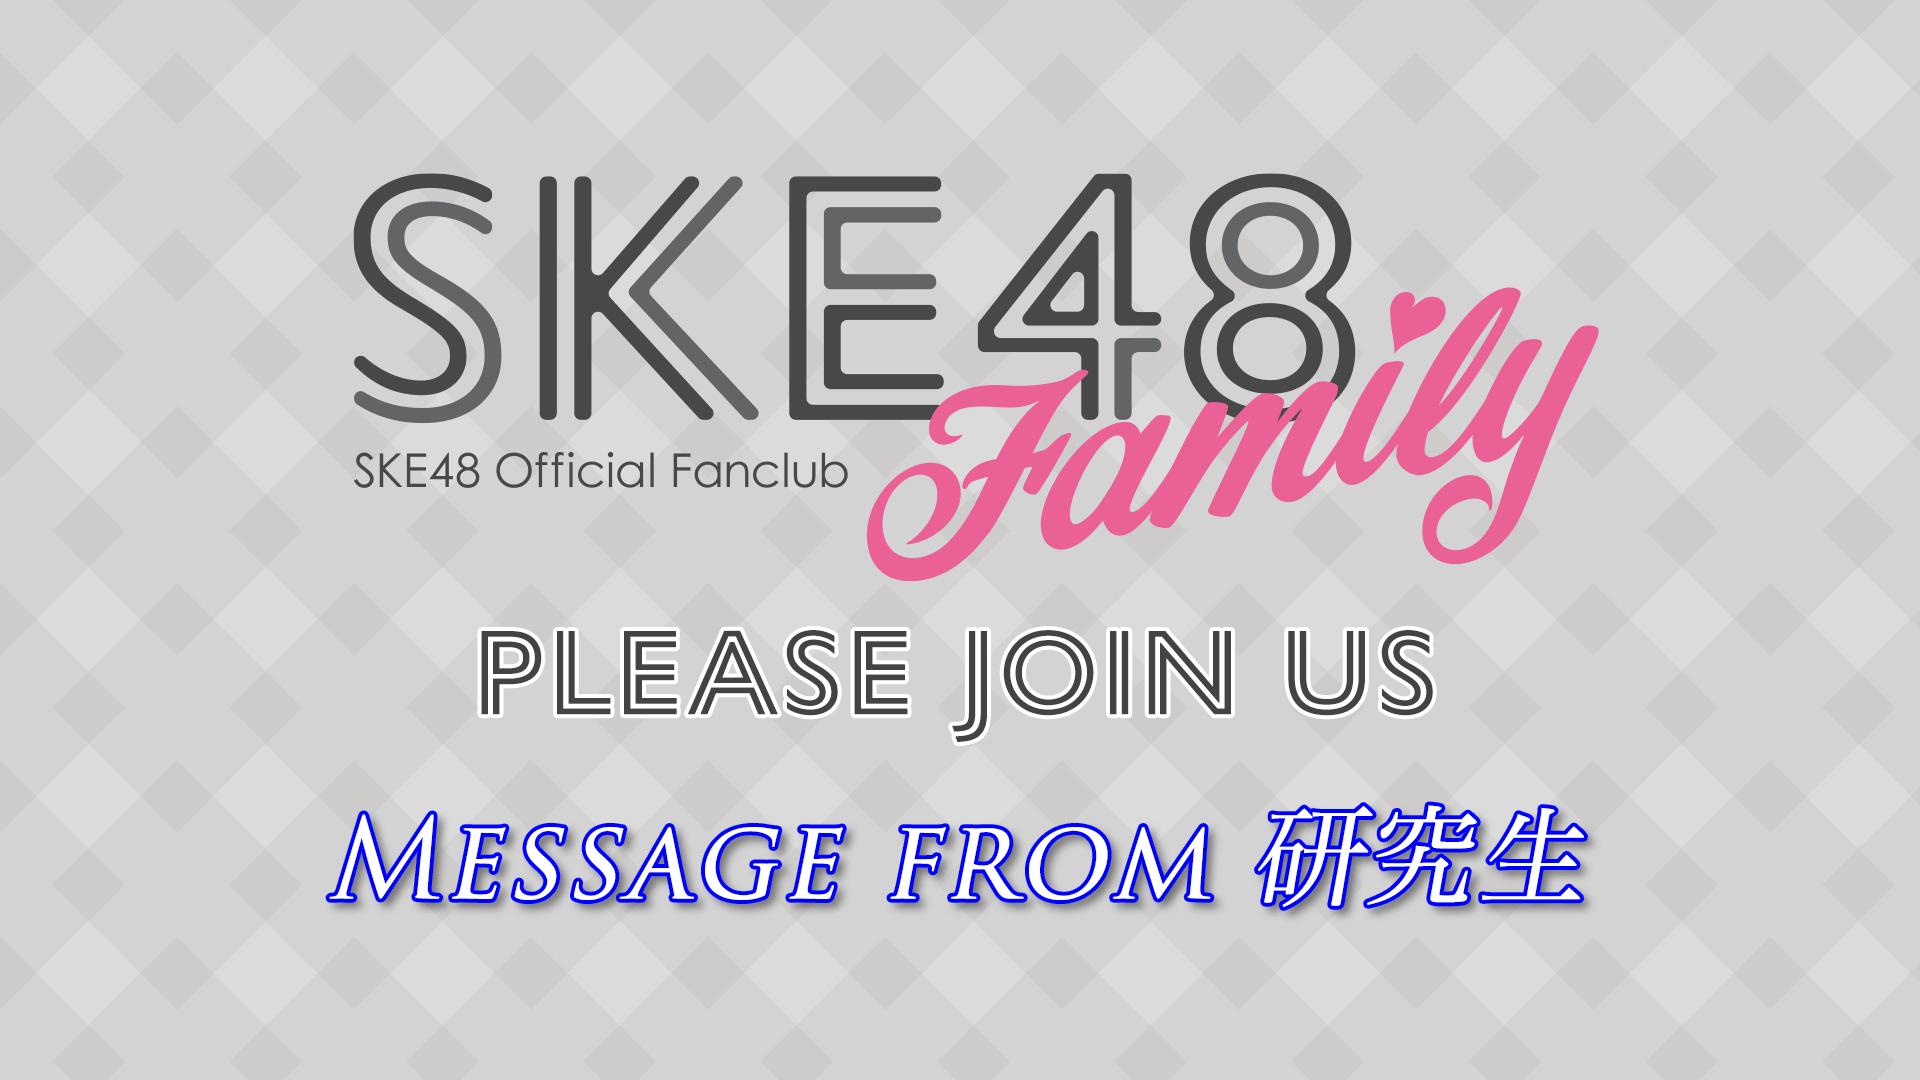 SKE48 Family入会受付中!9期研究生からのメッセージをどうぞ